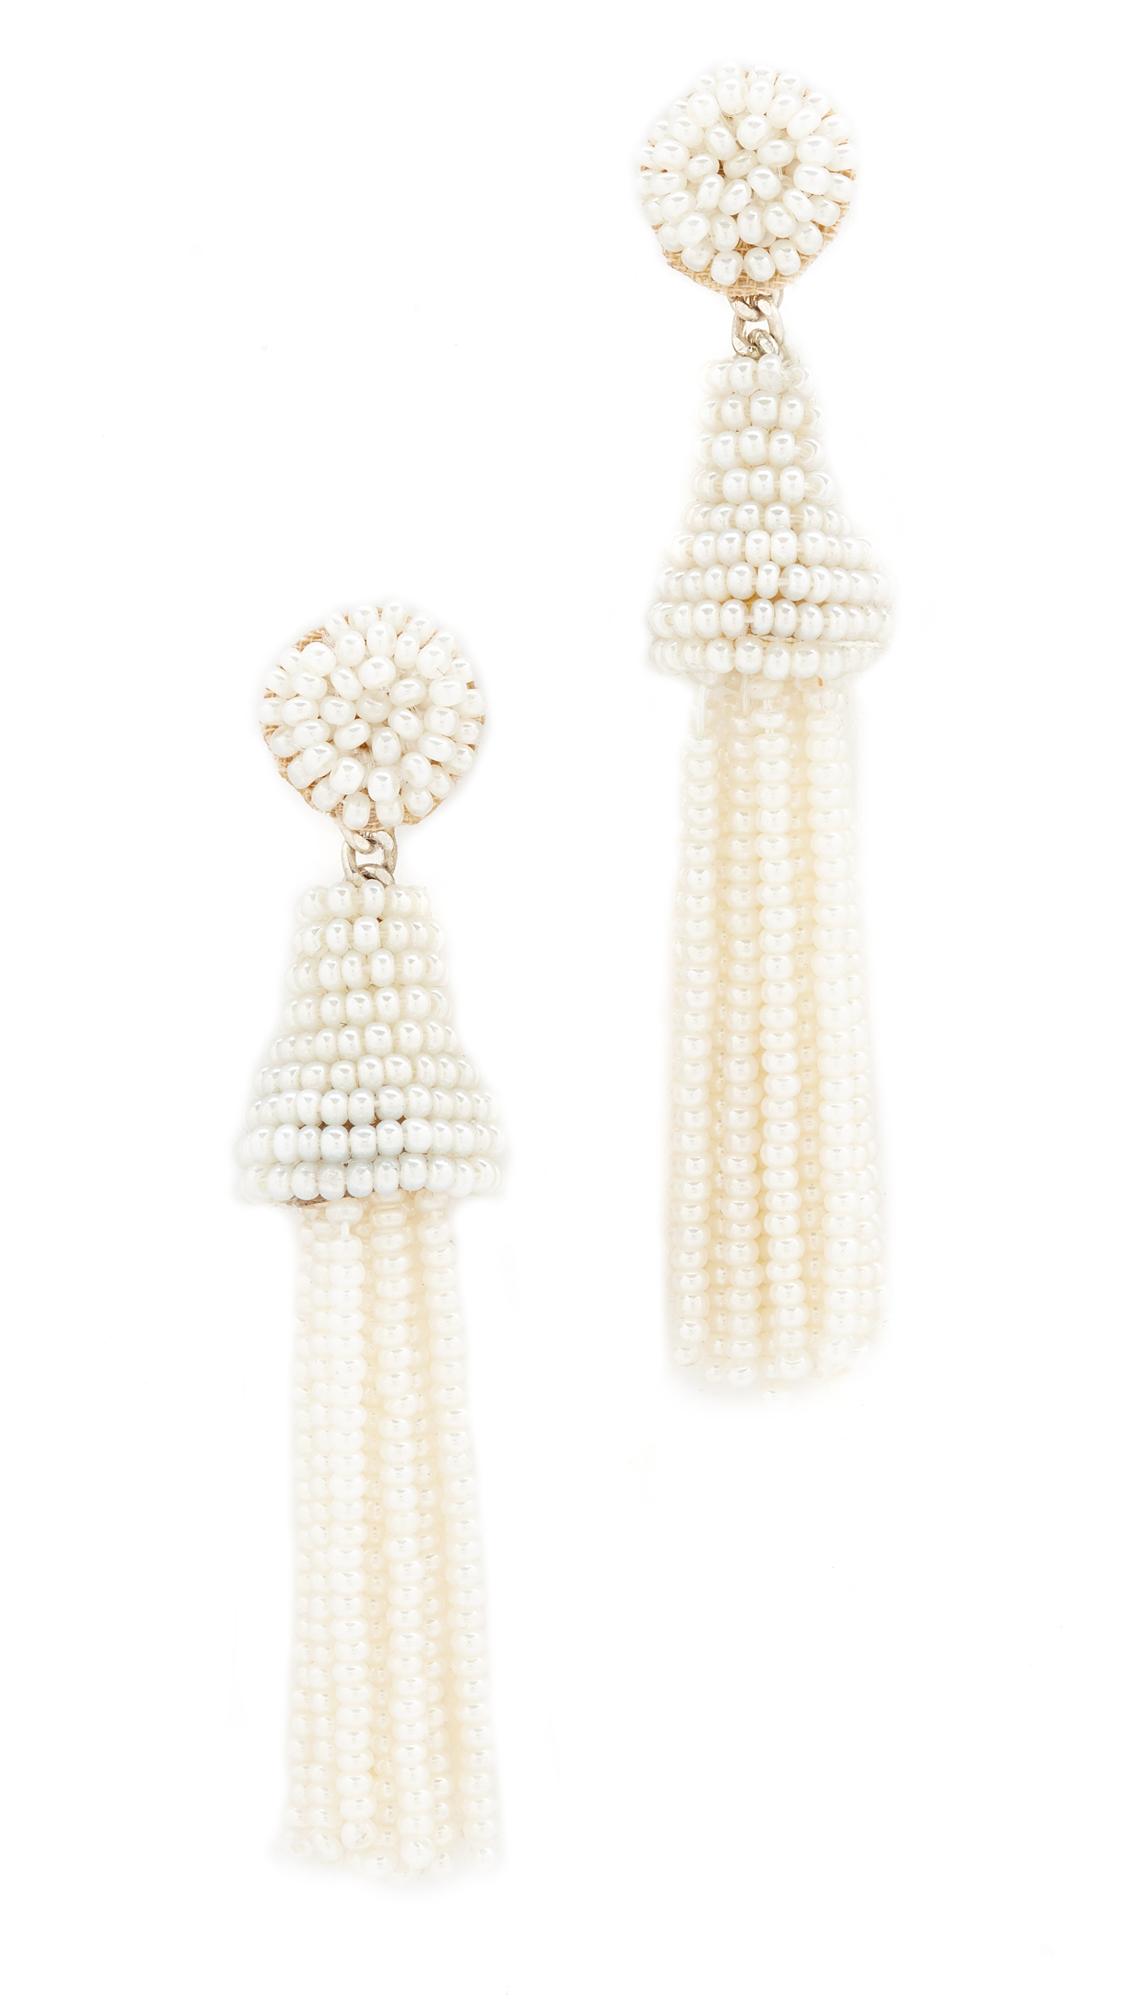 Deepa Gurnani Deepa by Deepa Gurnani Rose Earrings - White